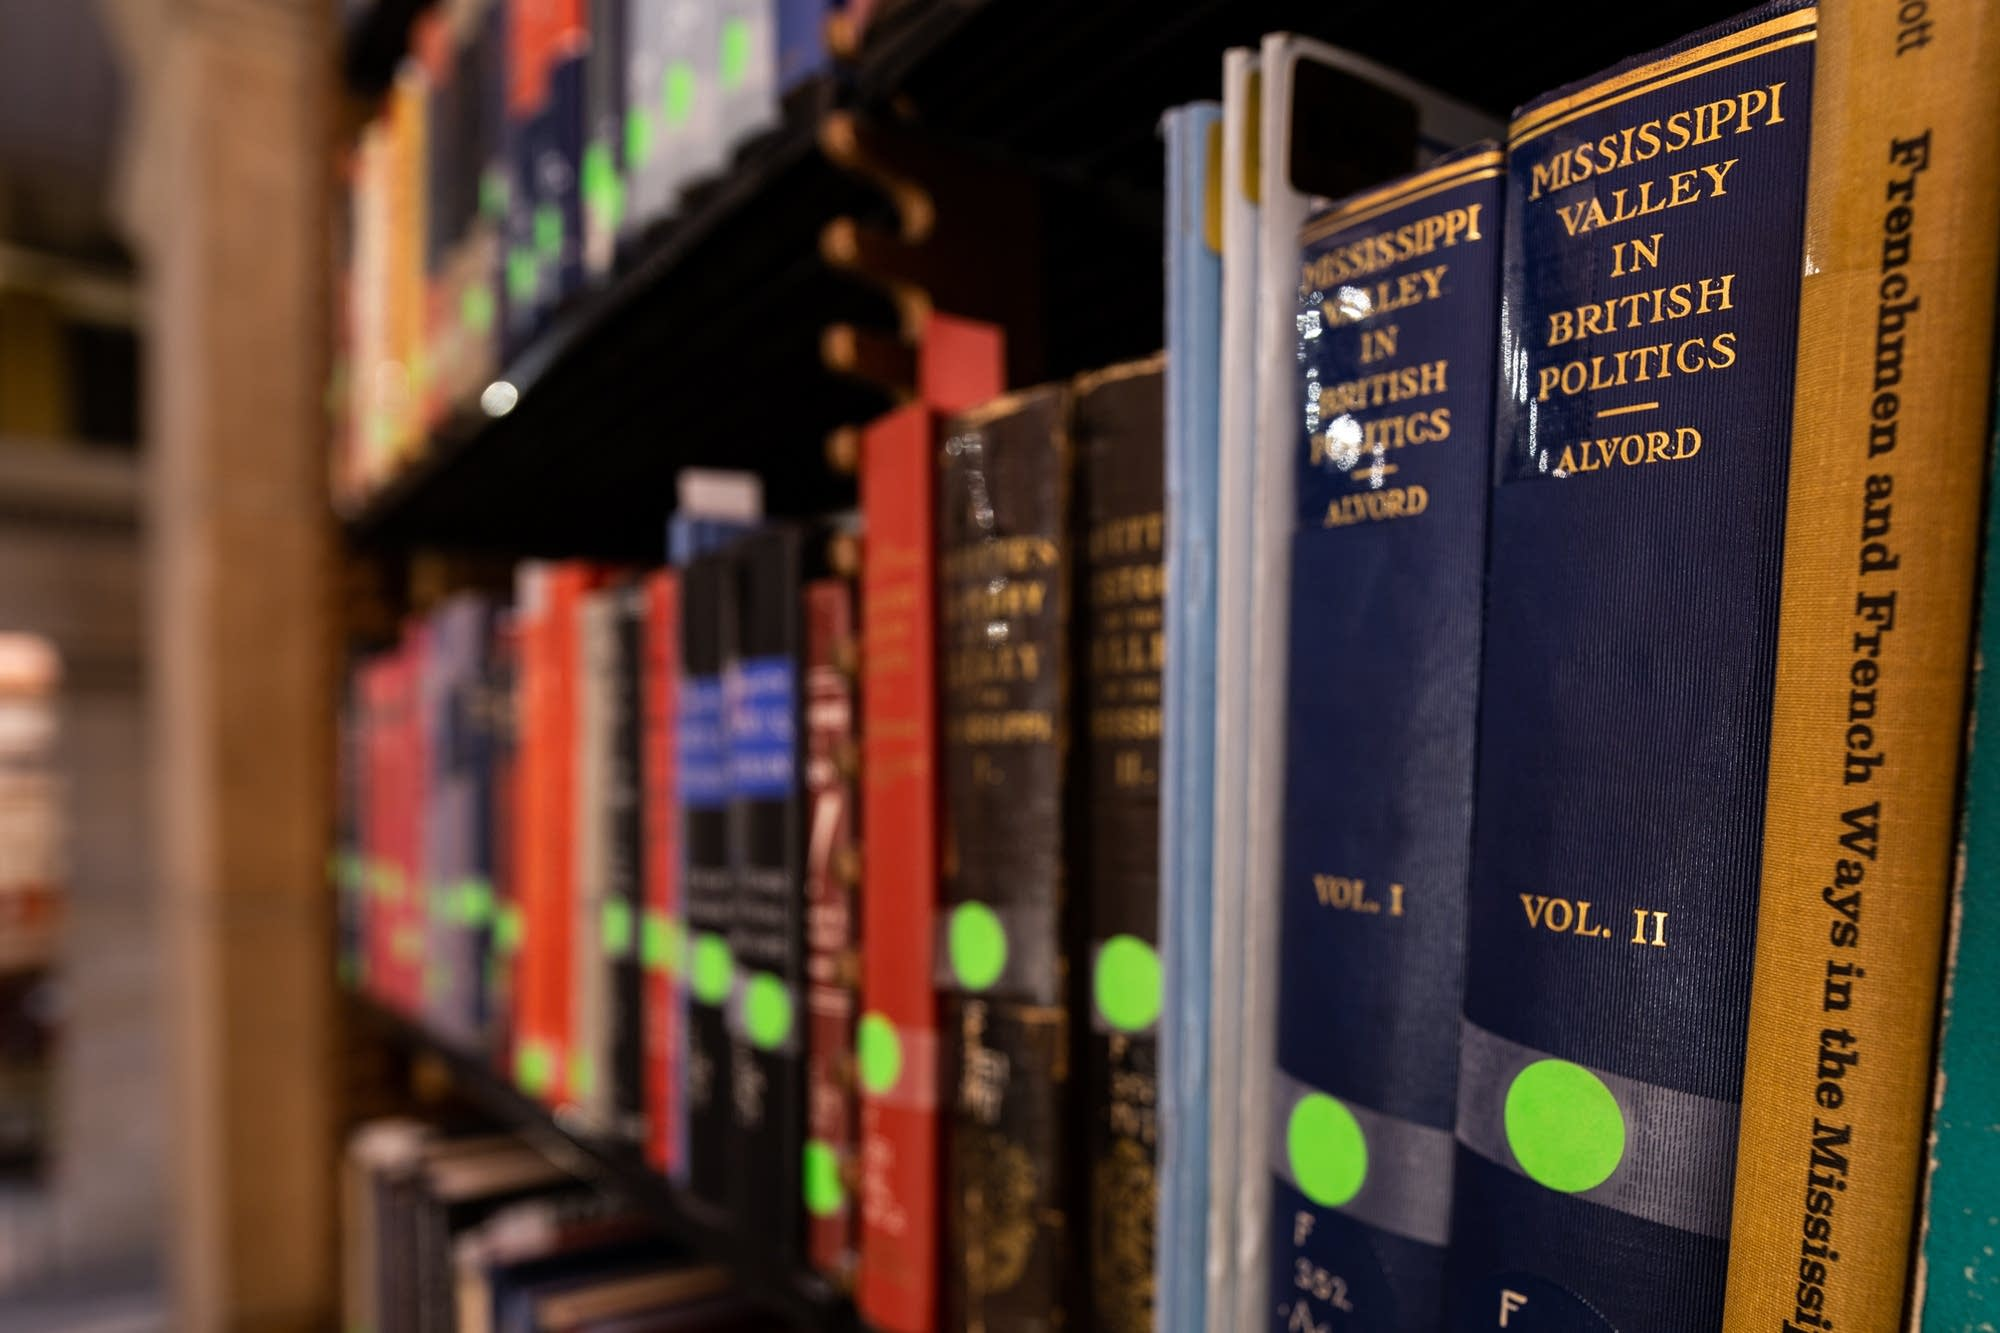 Historic books line the shelves of the James J. Hill Center in St. Paul.